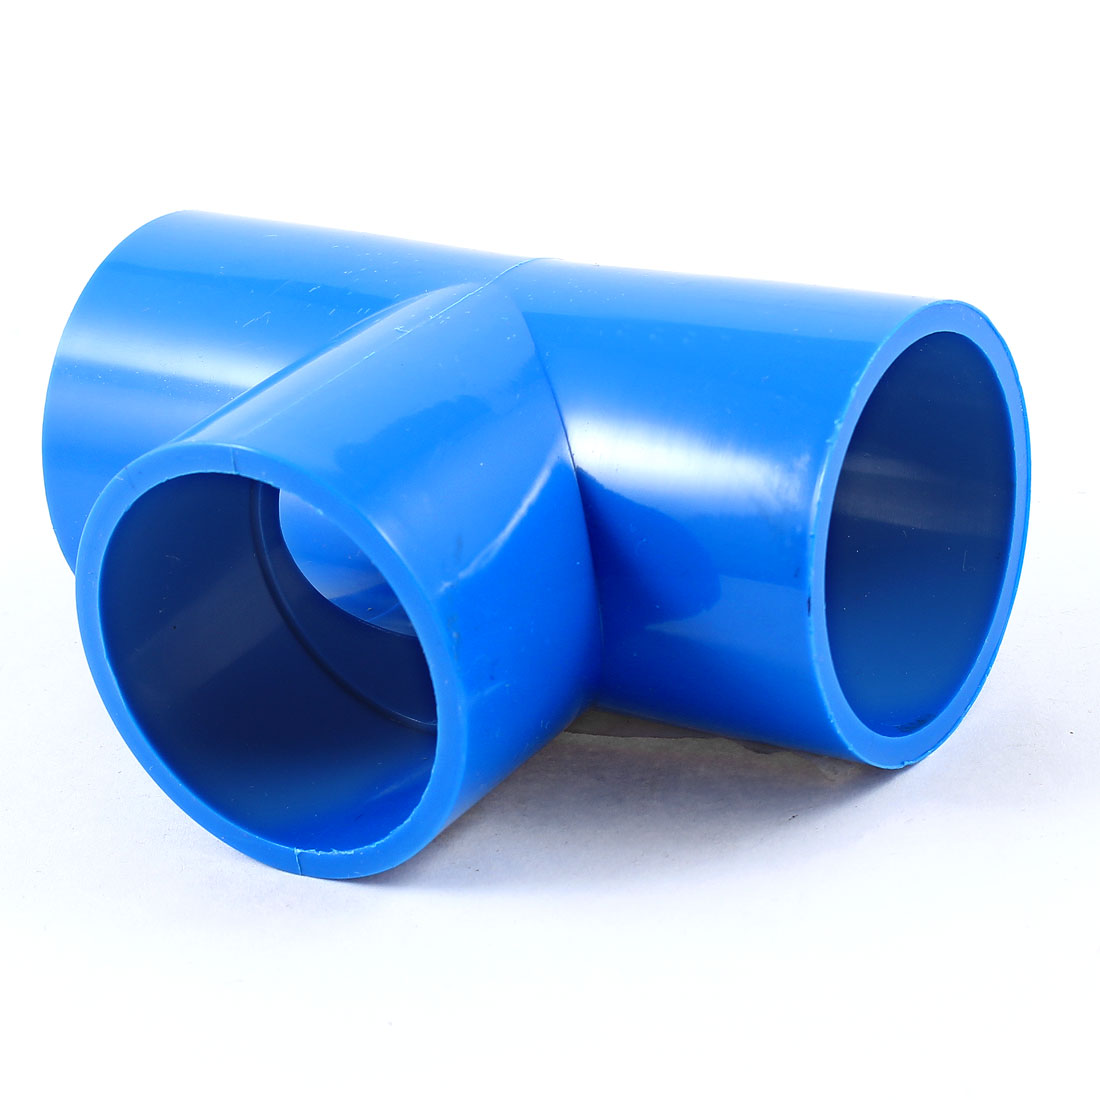 40mm-Inner-Diameter-T-Type-PVC-U-Pipe-Connector-Adapter-Blue